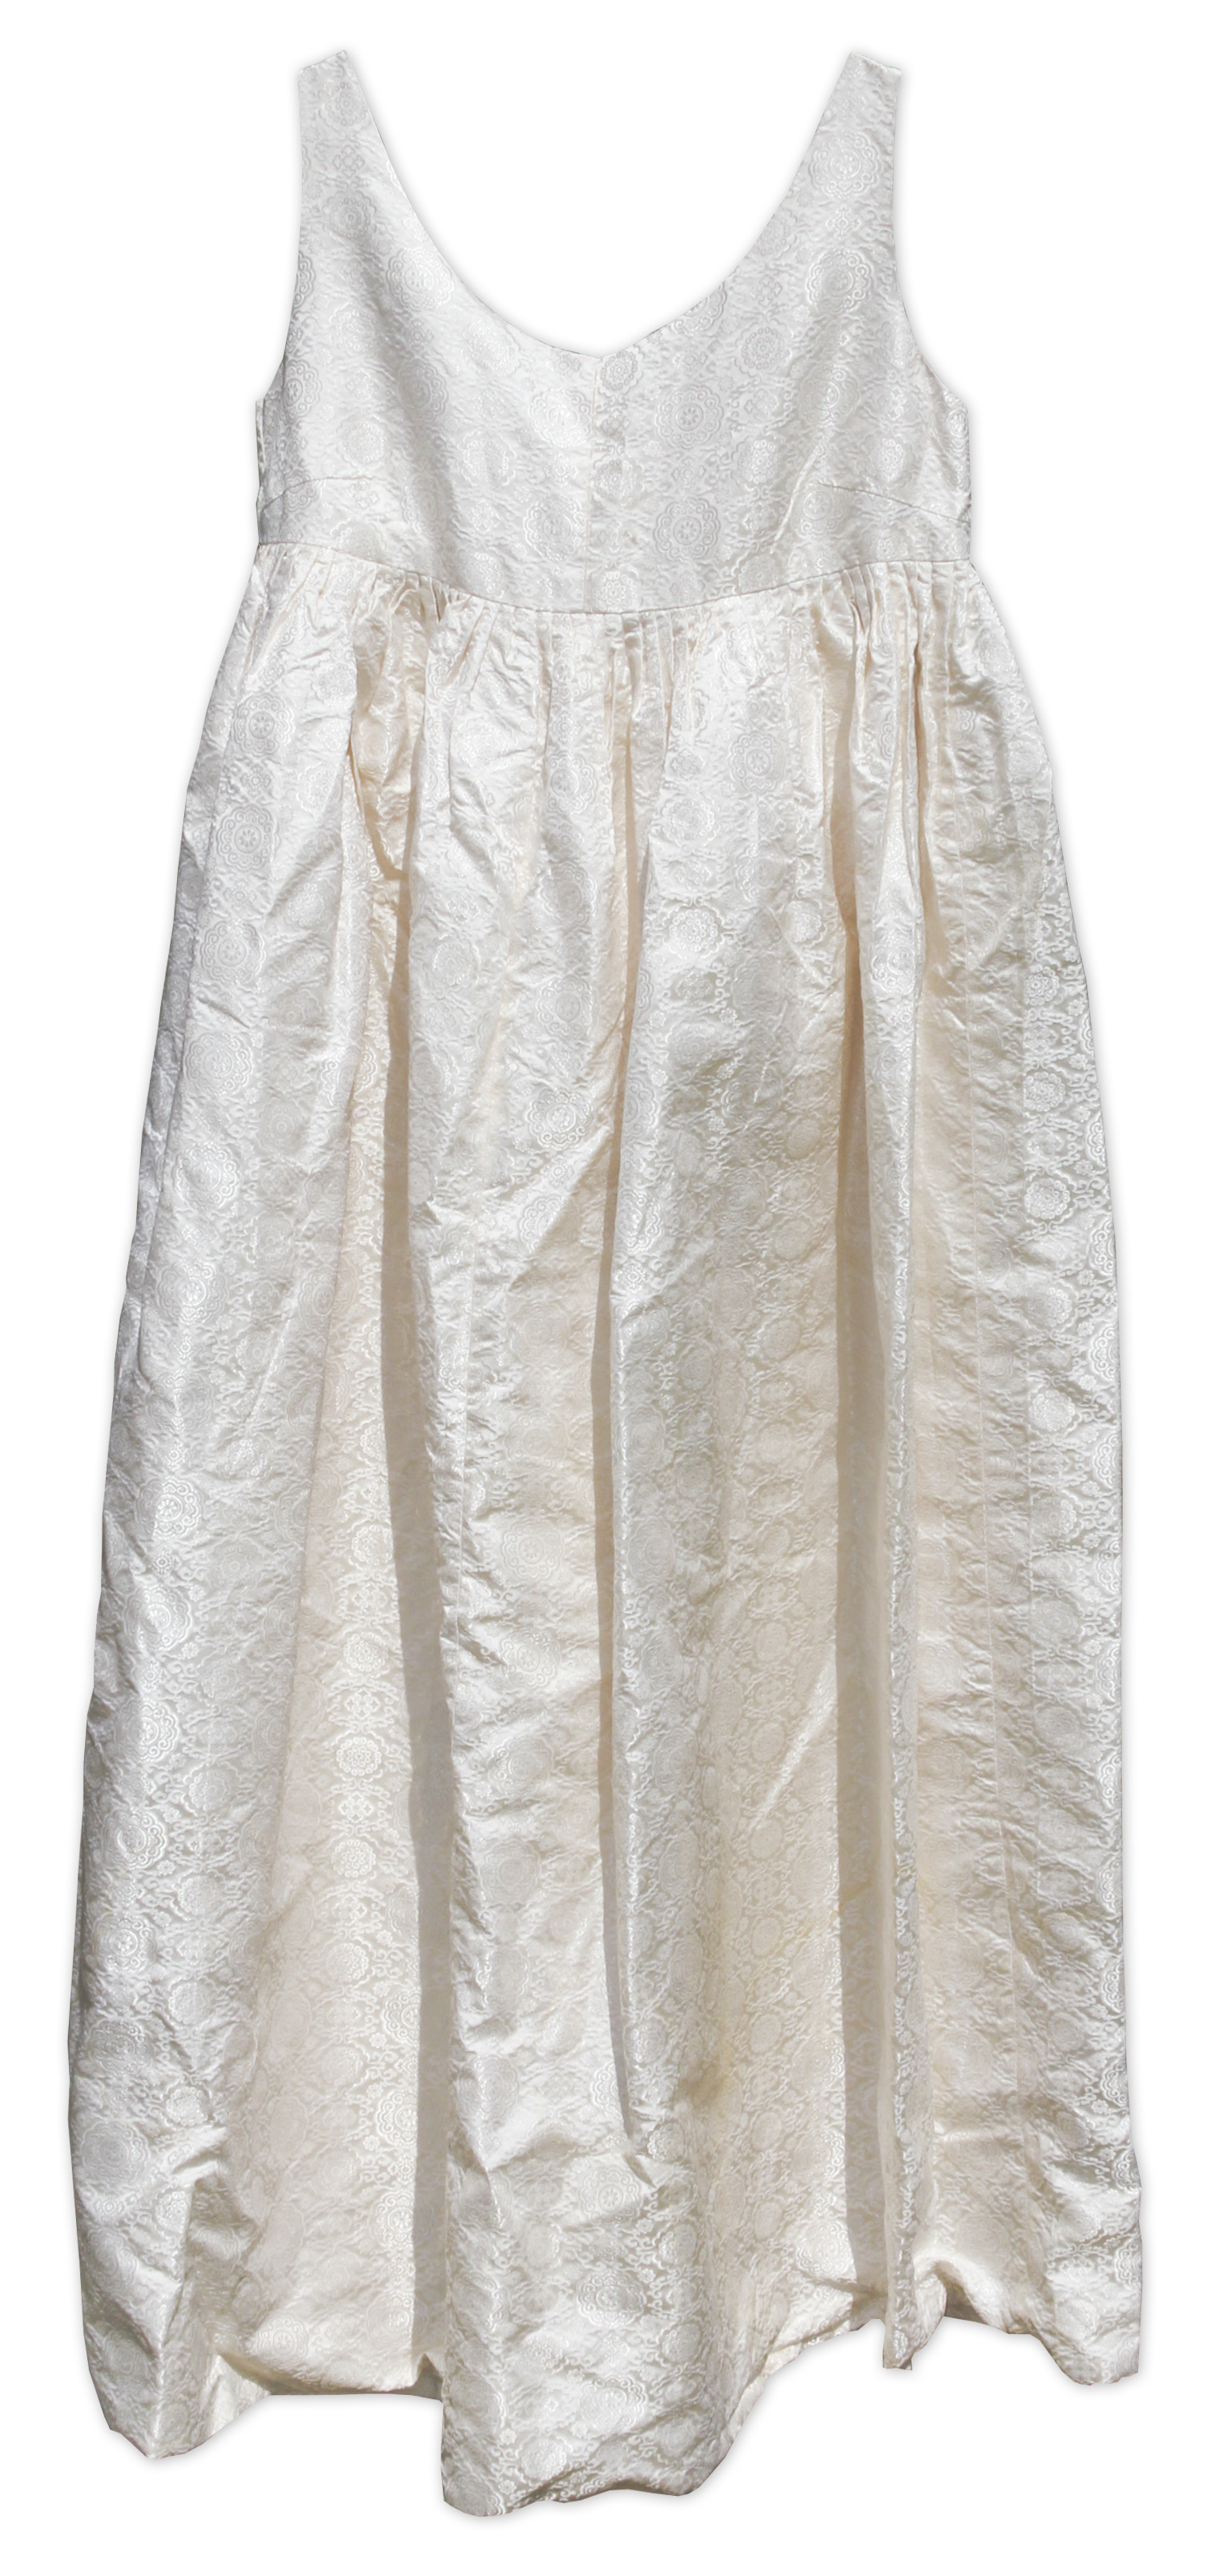 Jackie Kennedy Pregnant: Jacqueline Kennedy Maternity Dress -- Worn